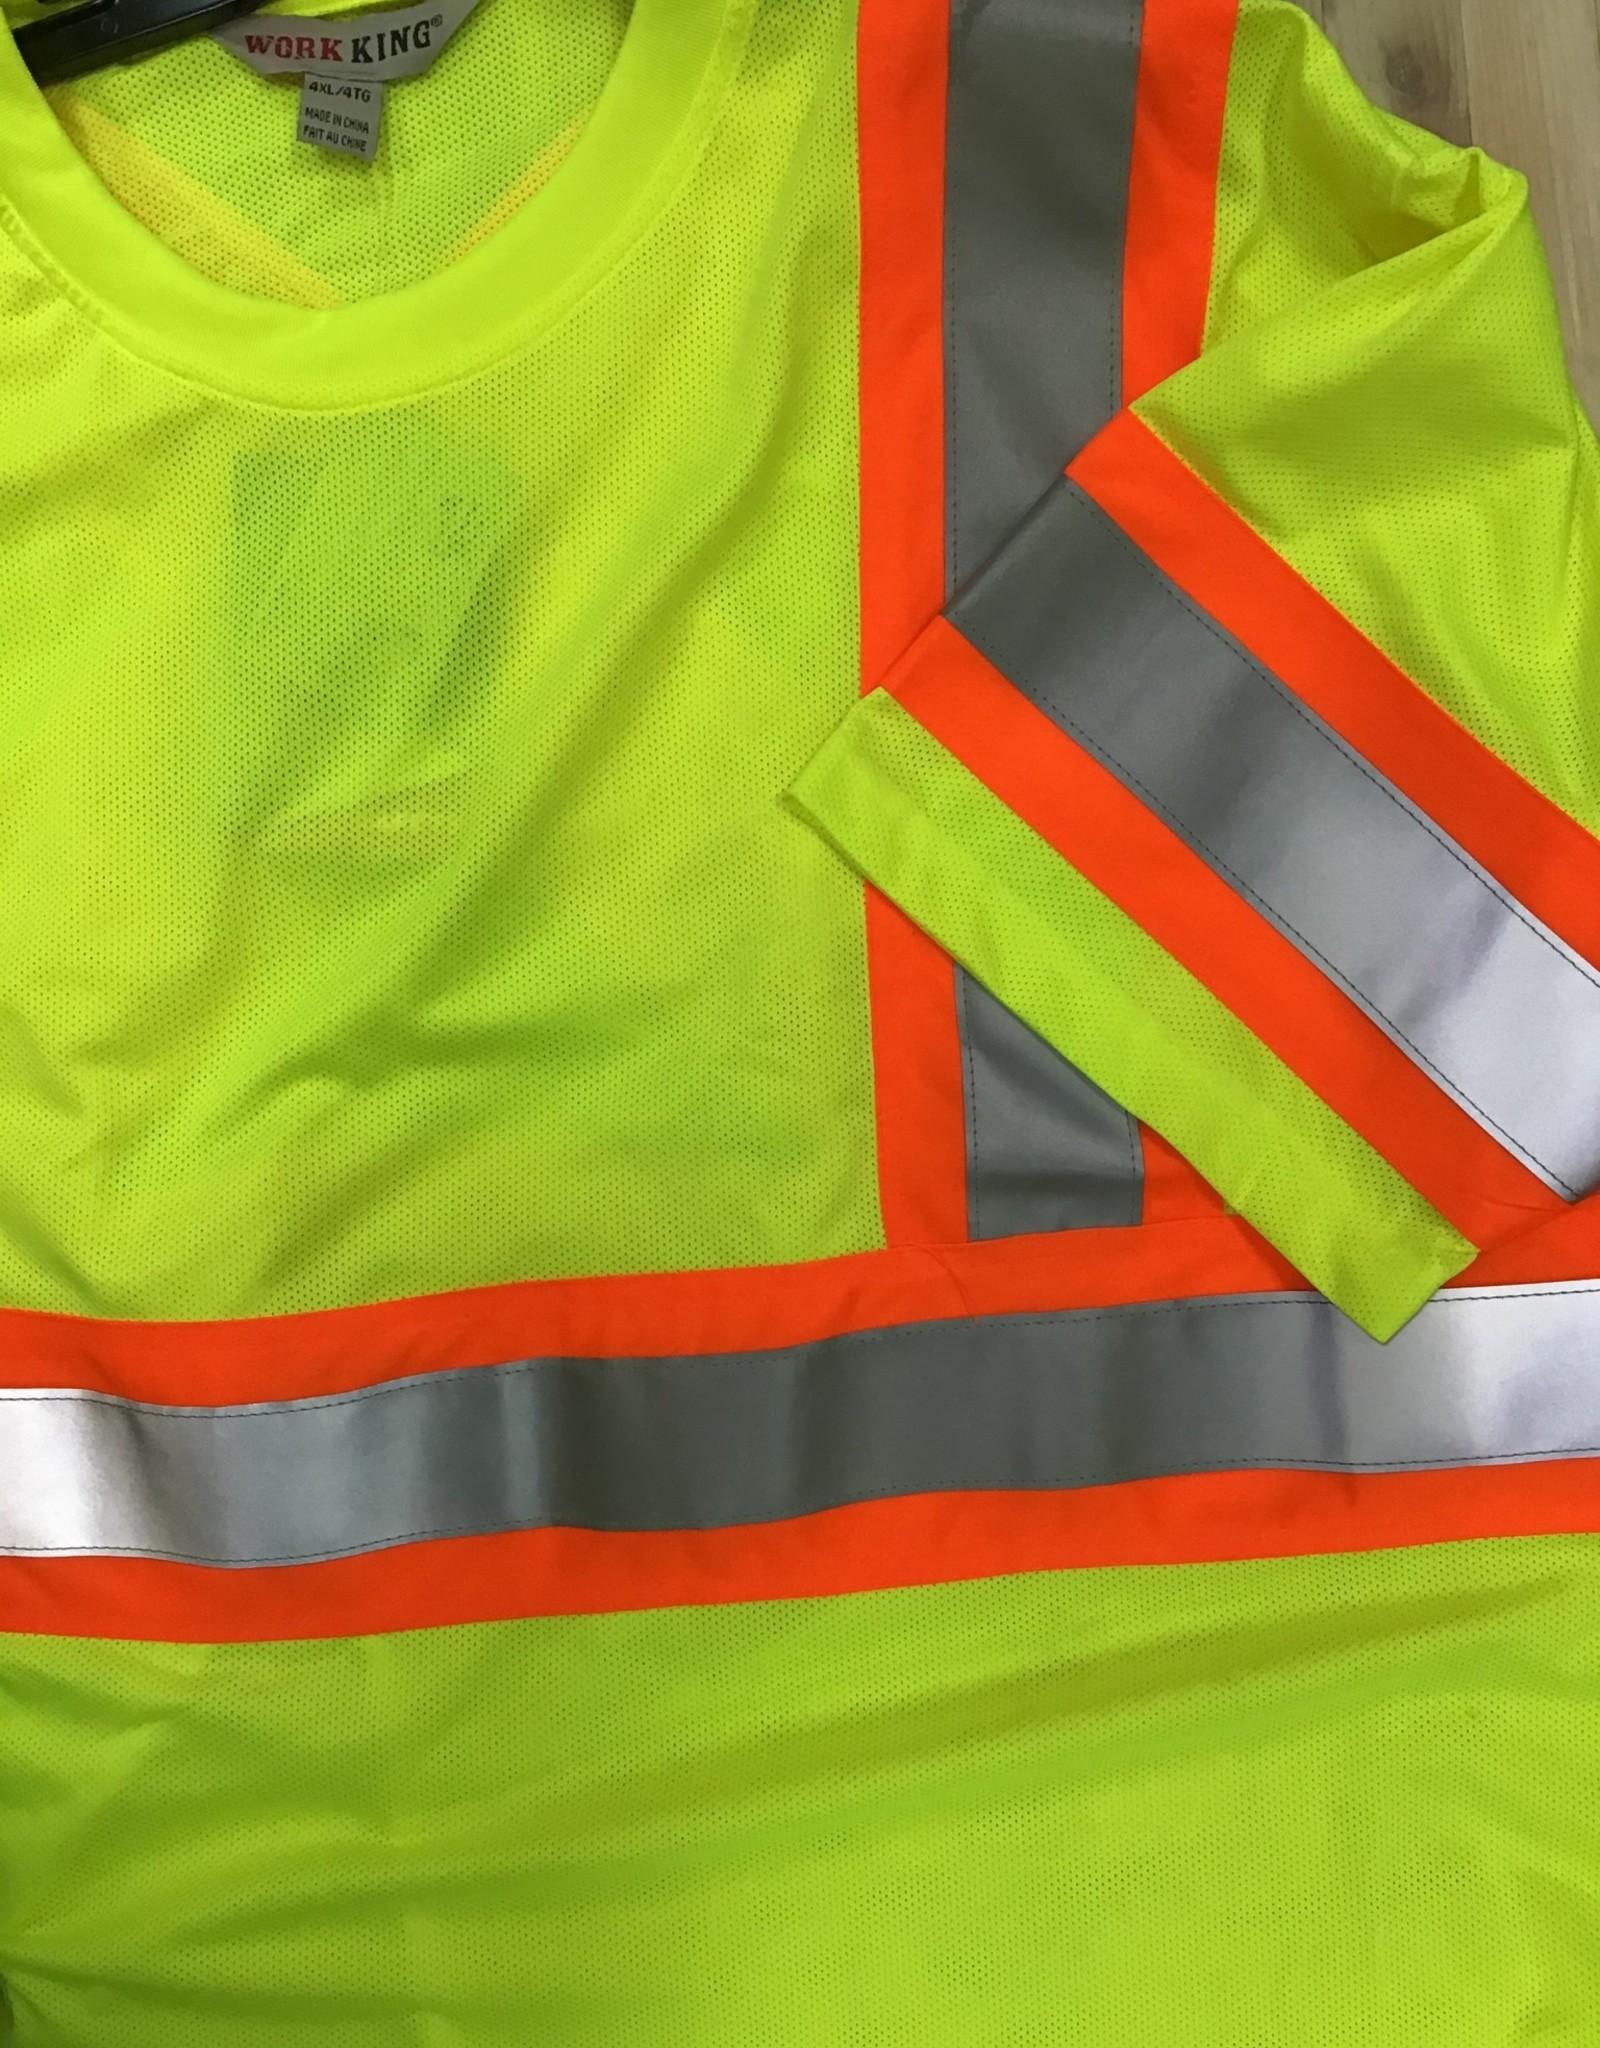 Work King Work King S394 Micro Mesh Safety S/S T-Shirt Men's